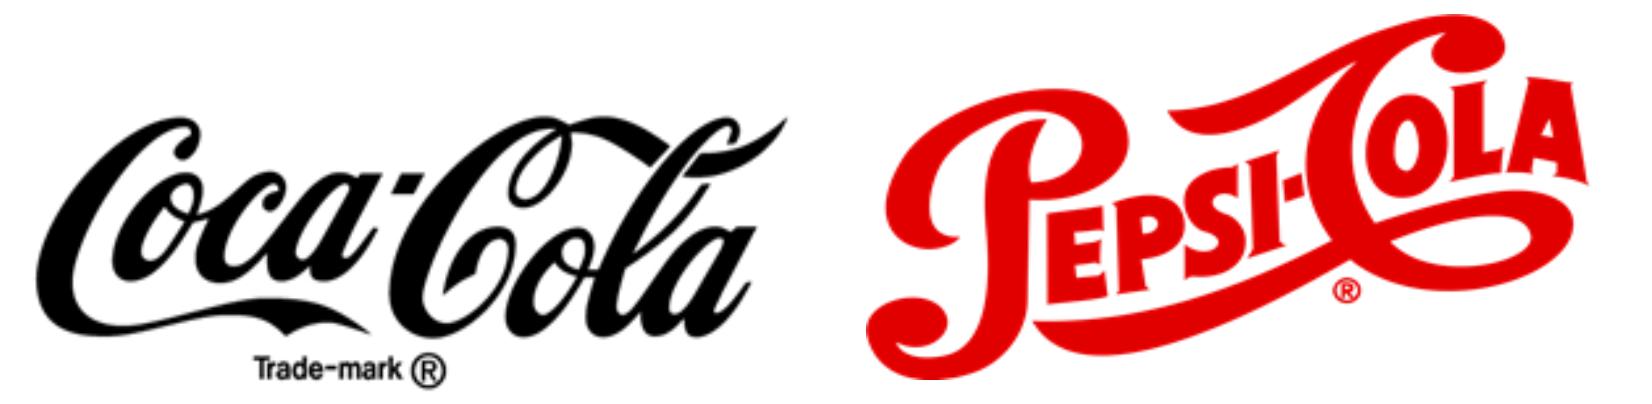 Classic Coca-Cola and Pepsi-Cola logos in the 40s